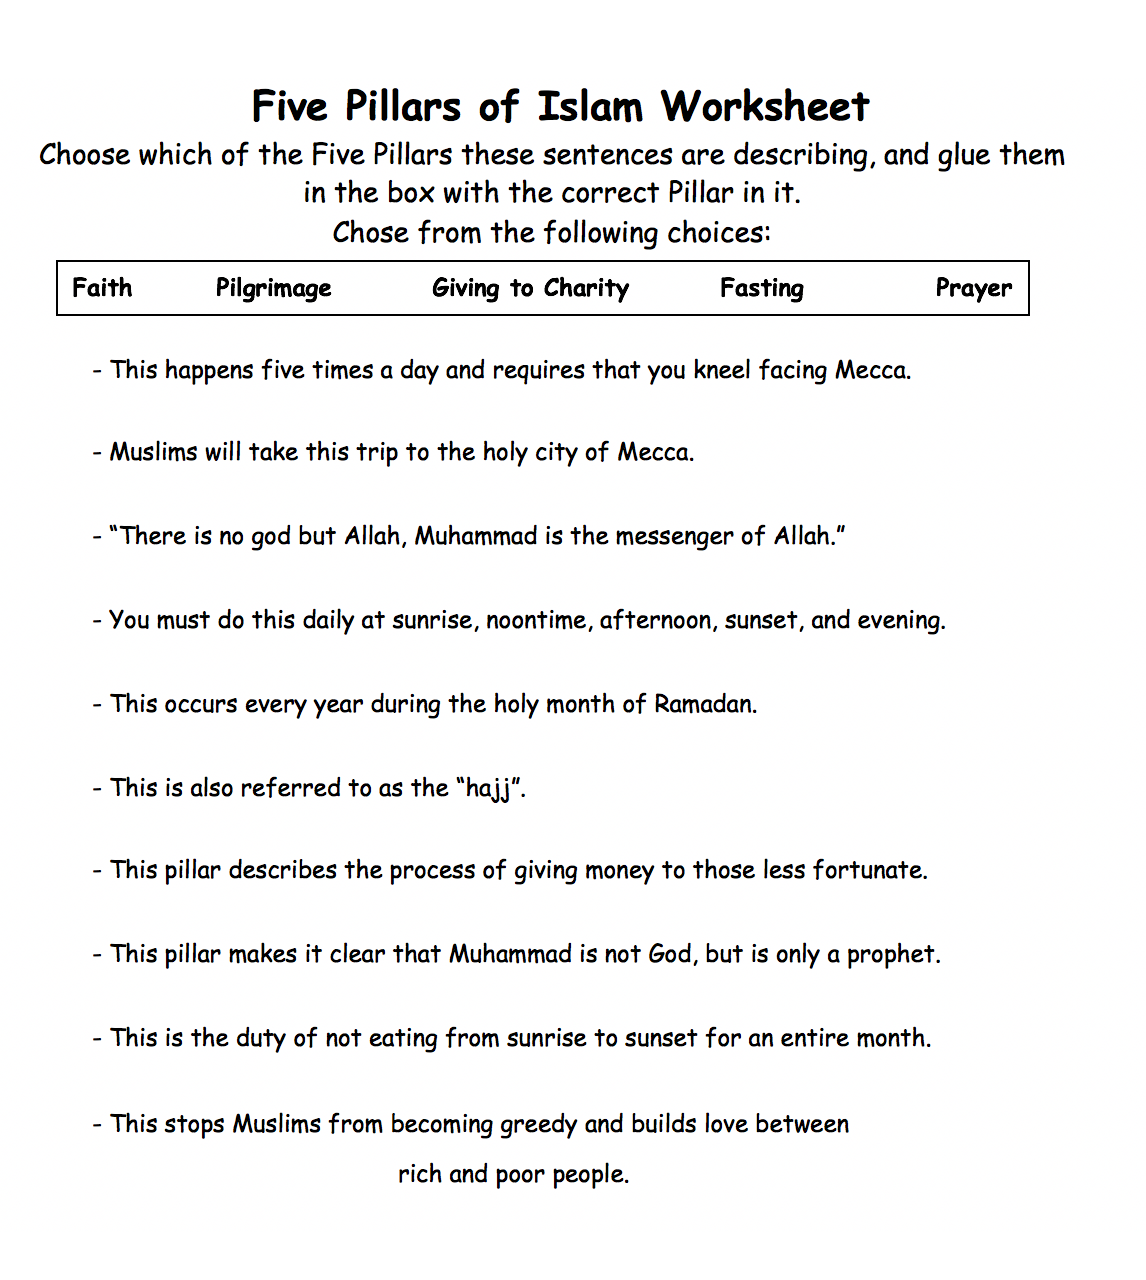 five pillars of islam worksheet 1 safar resources beta. Black Bedroom Furniture Sets. Home Design Ideas